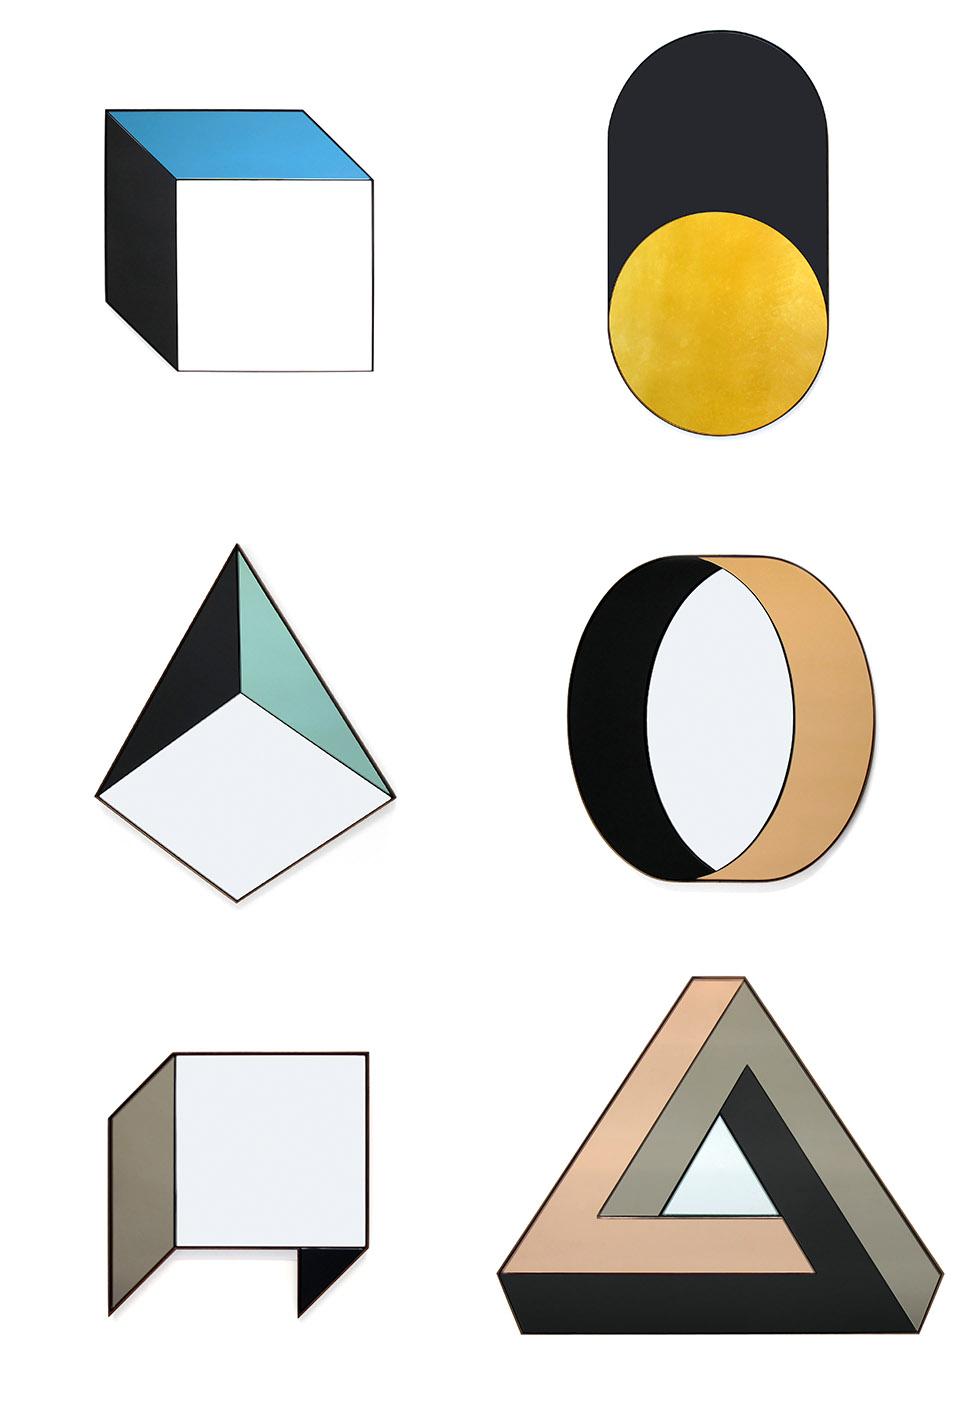 shape-mirror-hisheji (4)